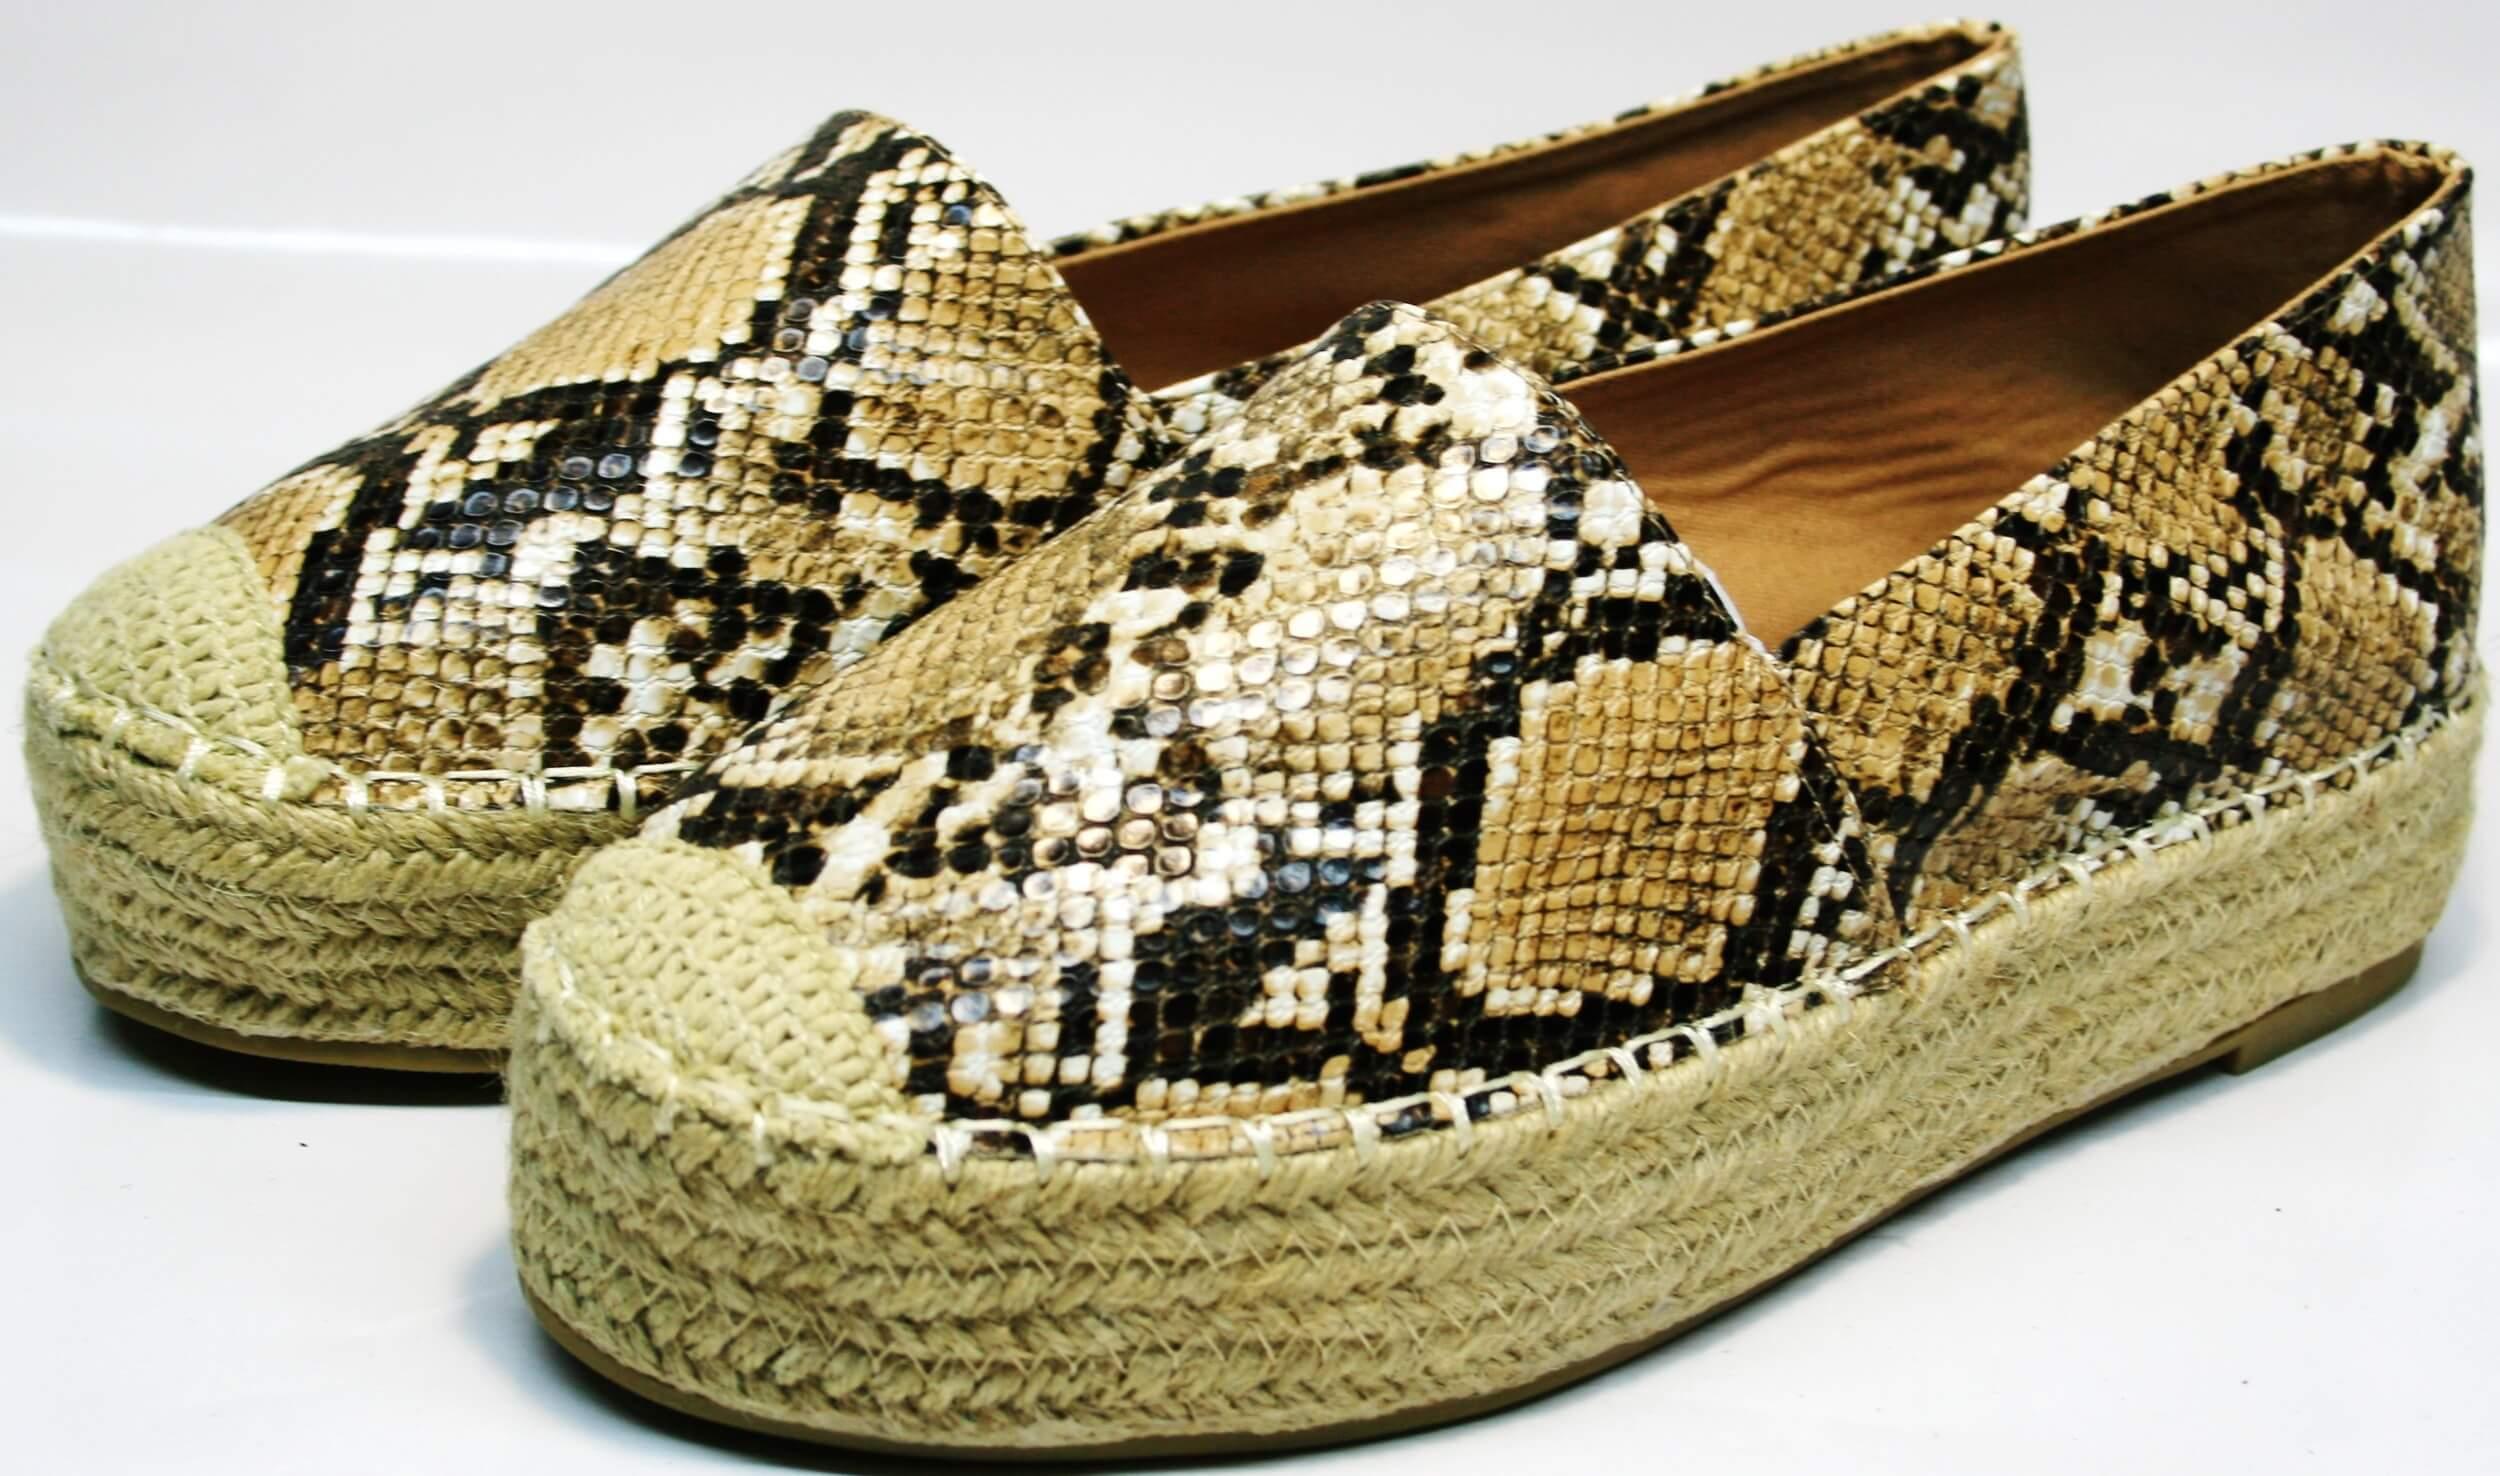 fdc1b139 Интернет магазин Grand предлагает: женские эспадрильи на толстой подошве  Lilyshoes Q38snake - закрытые летние туфли без каблука.